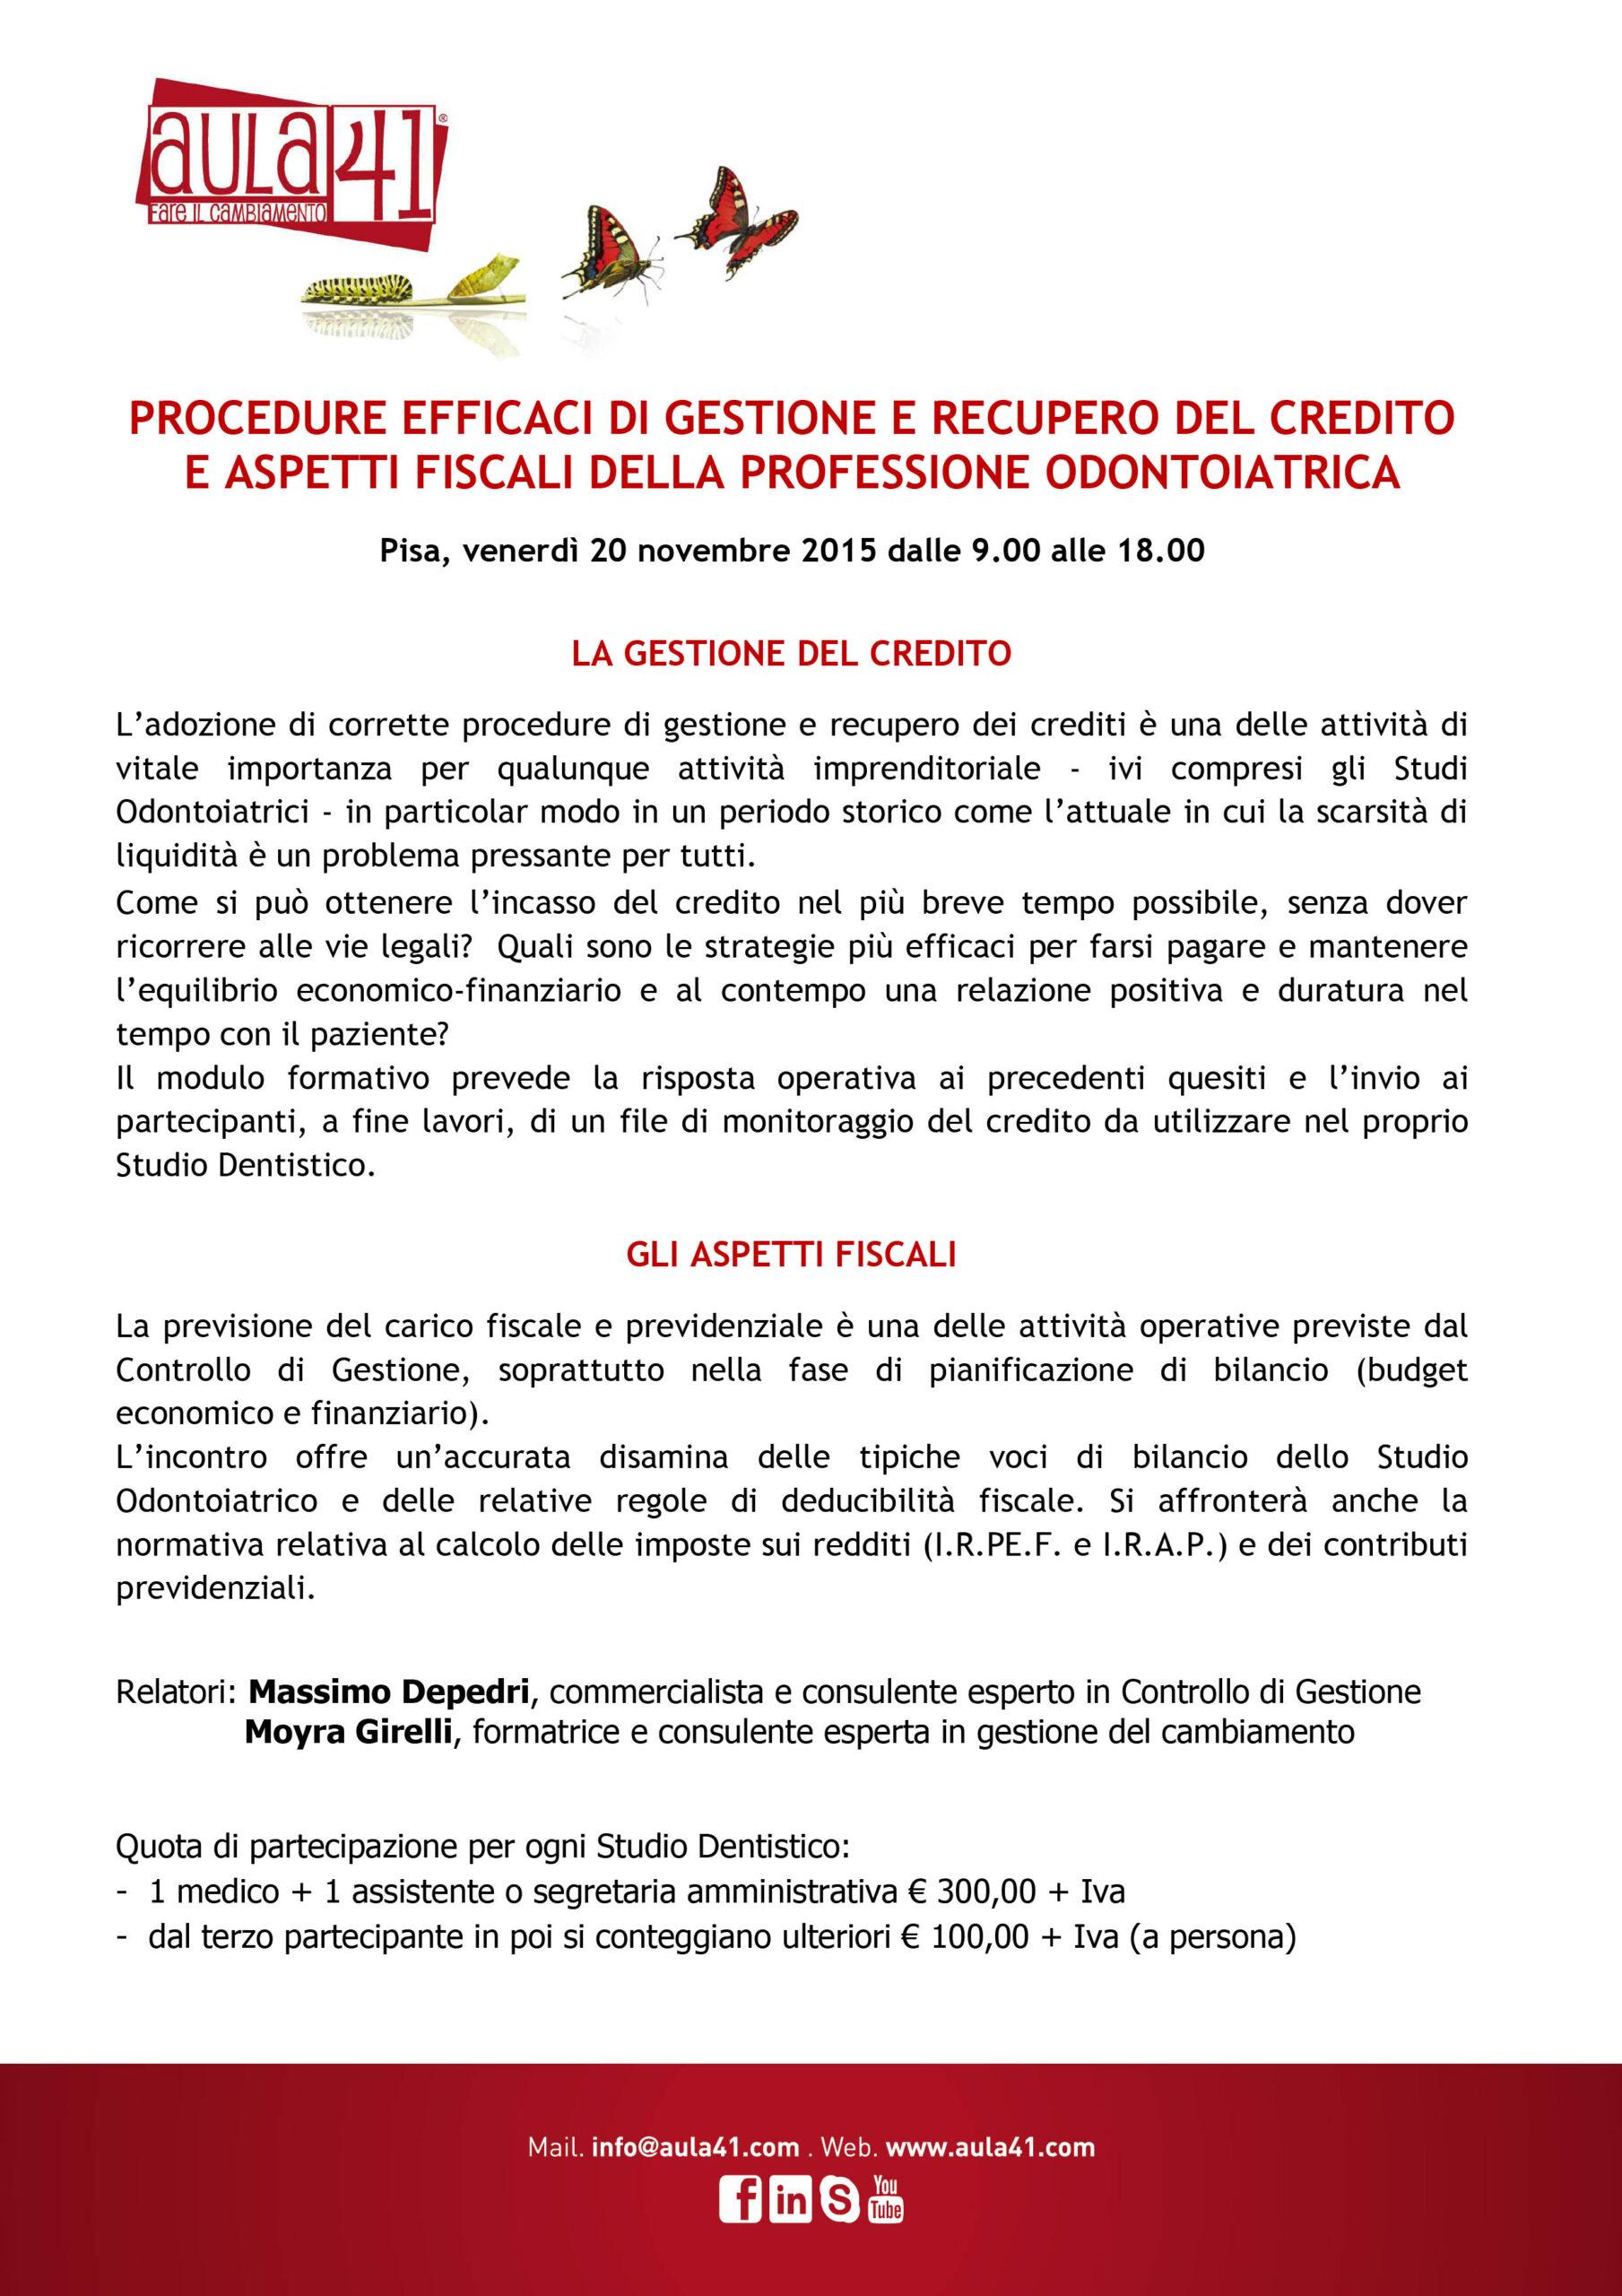 Aula41_locandina_Pisa_20nov2015_2